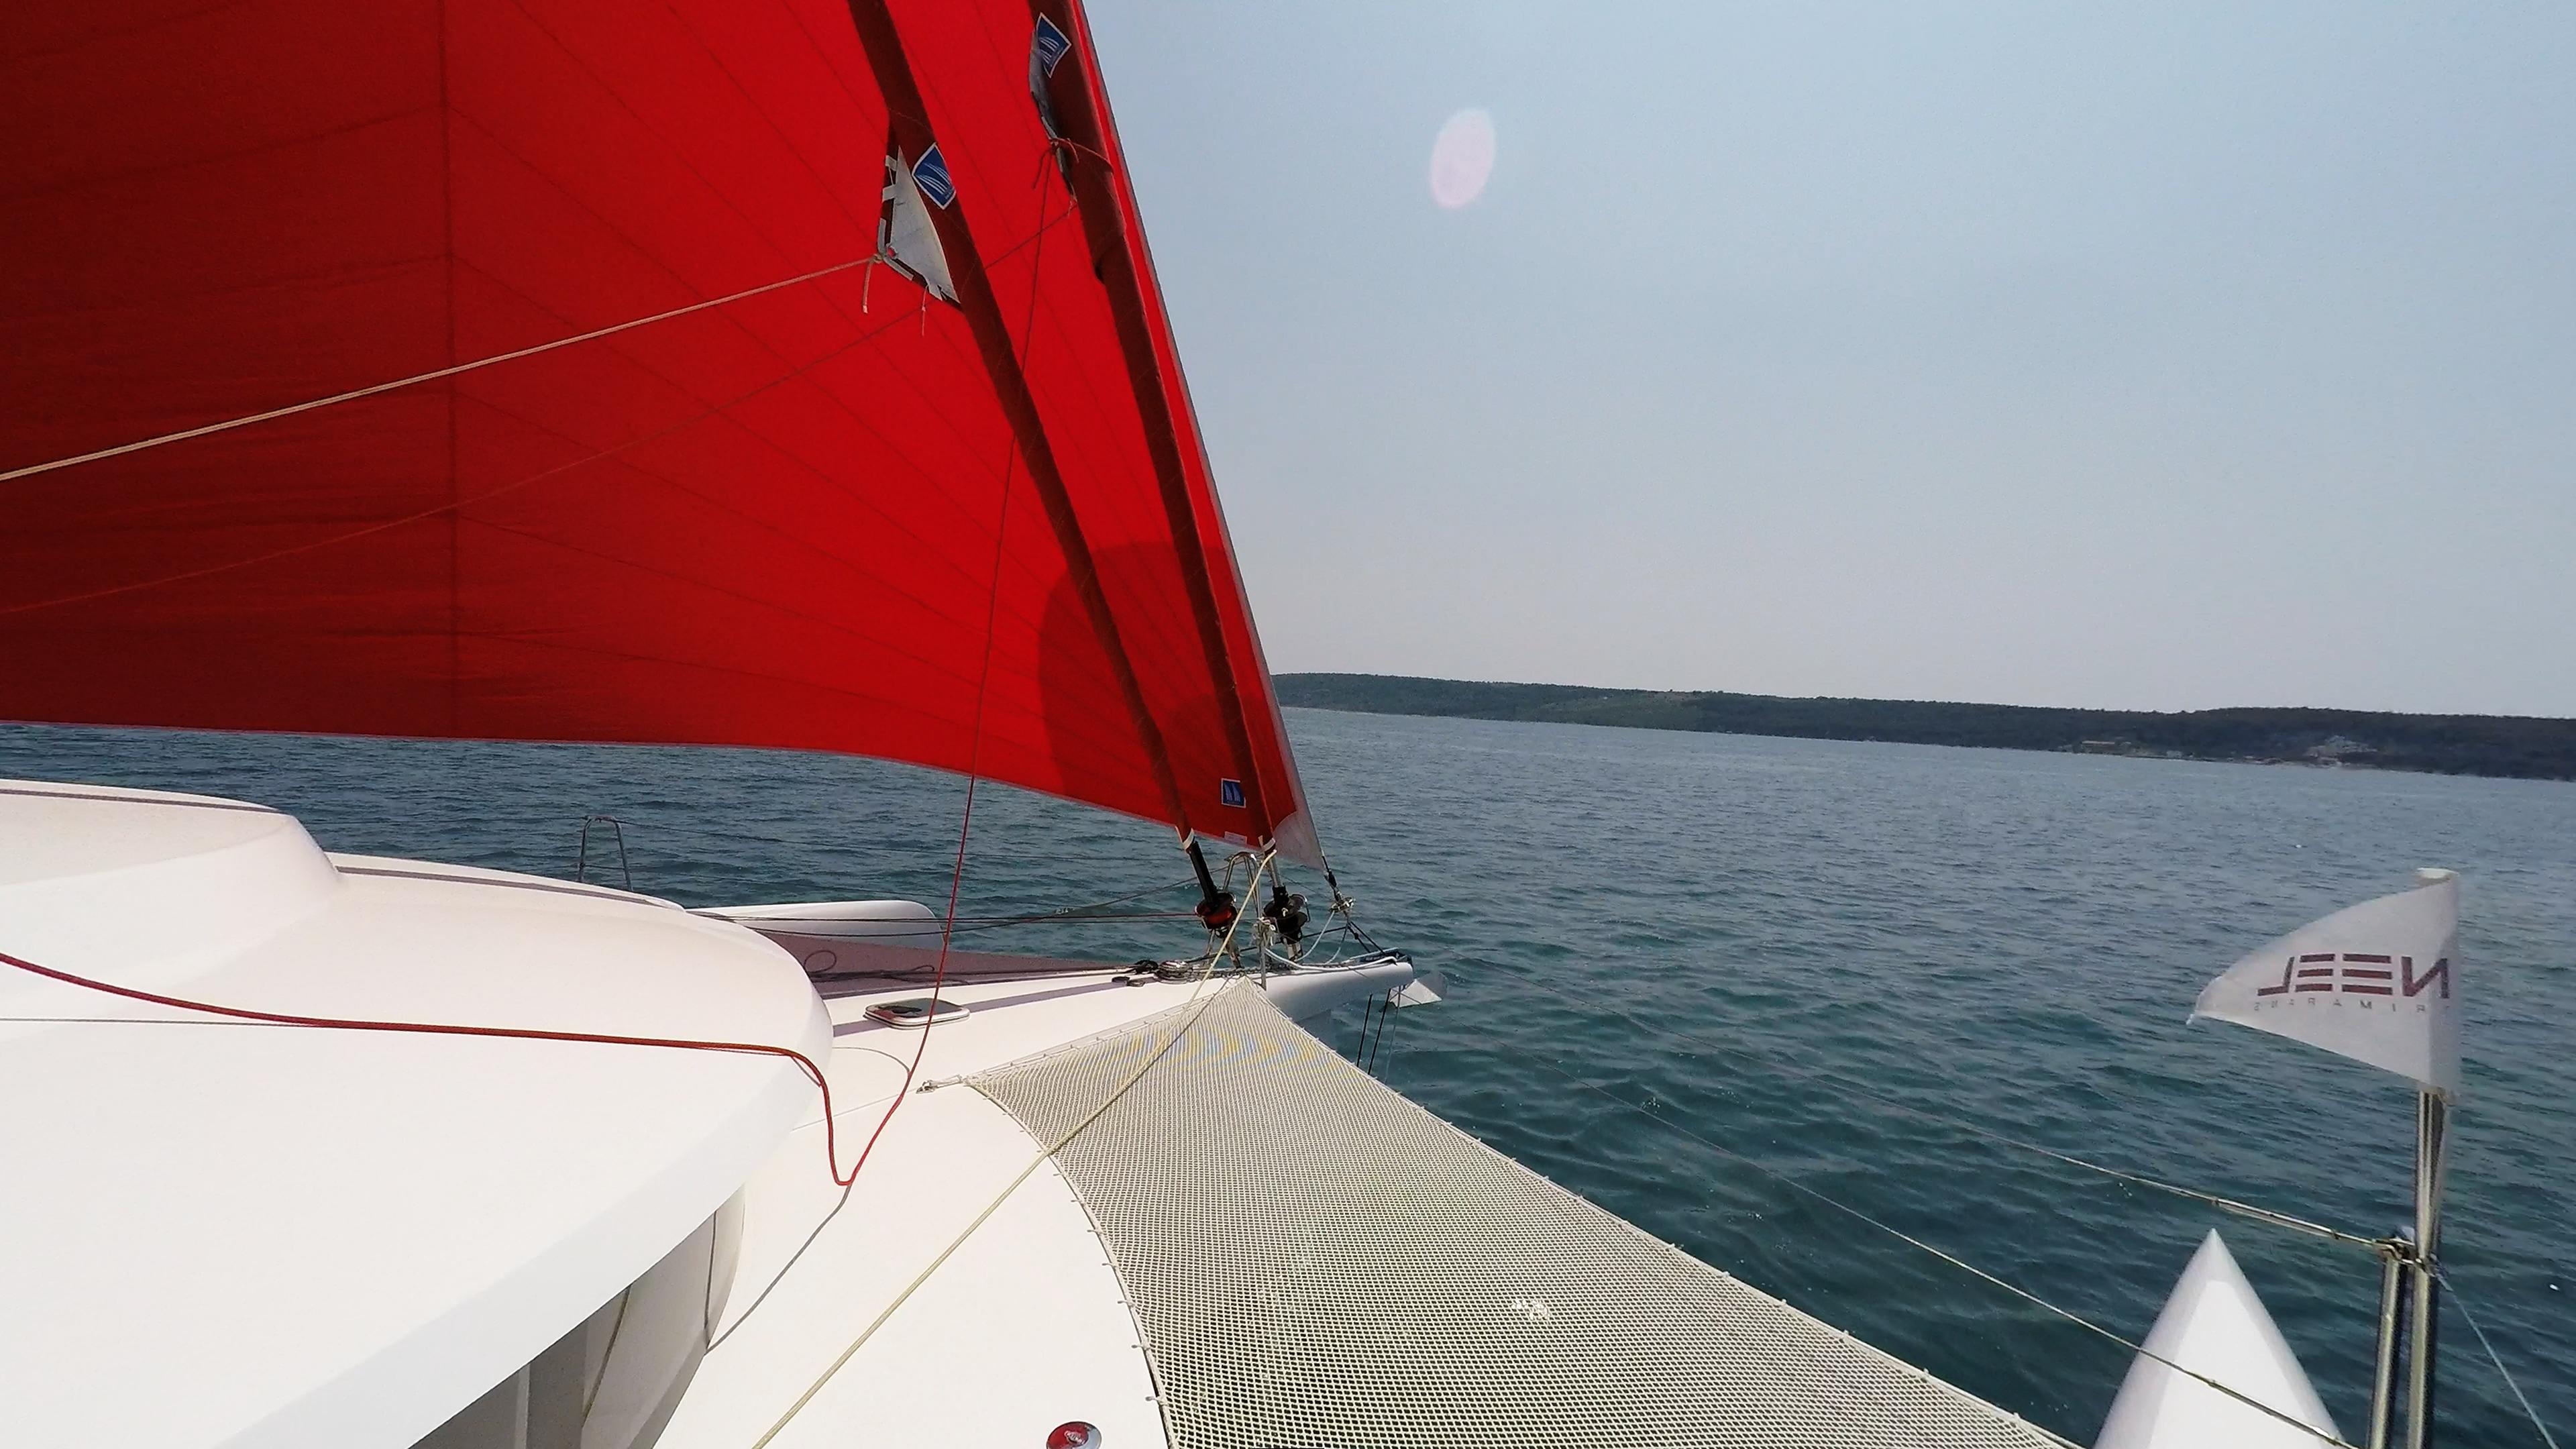 neel 45 prua trimarano yacht vela gennaker